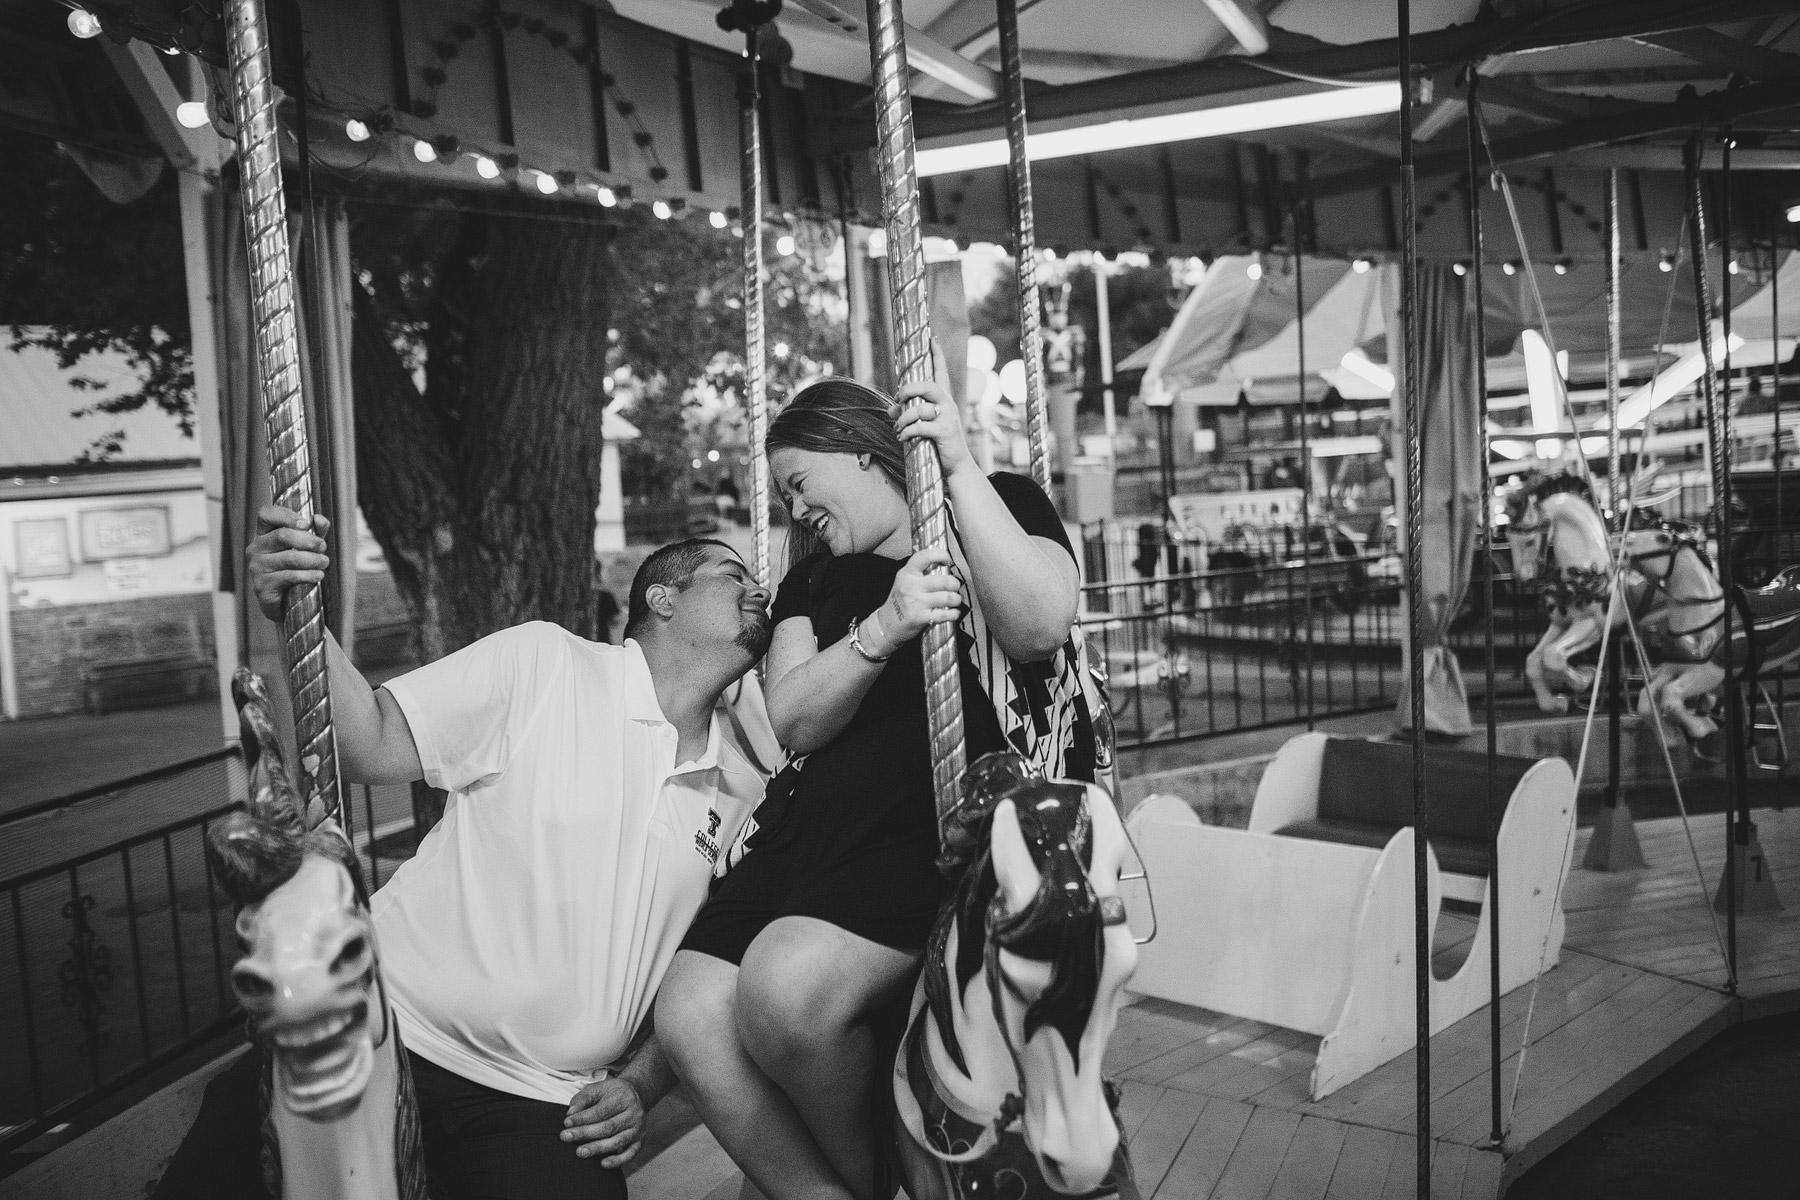 kristin_bednarz_documentary_wedding_photographer_20190615_00739_Hobson_Sharp.jpg